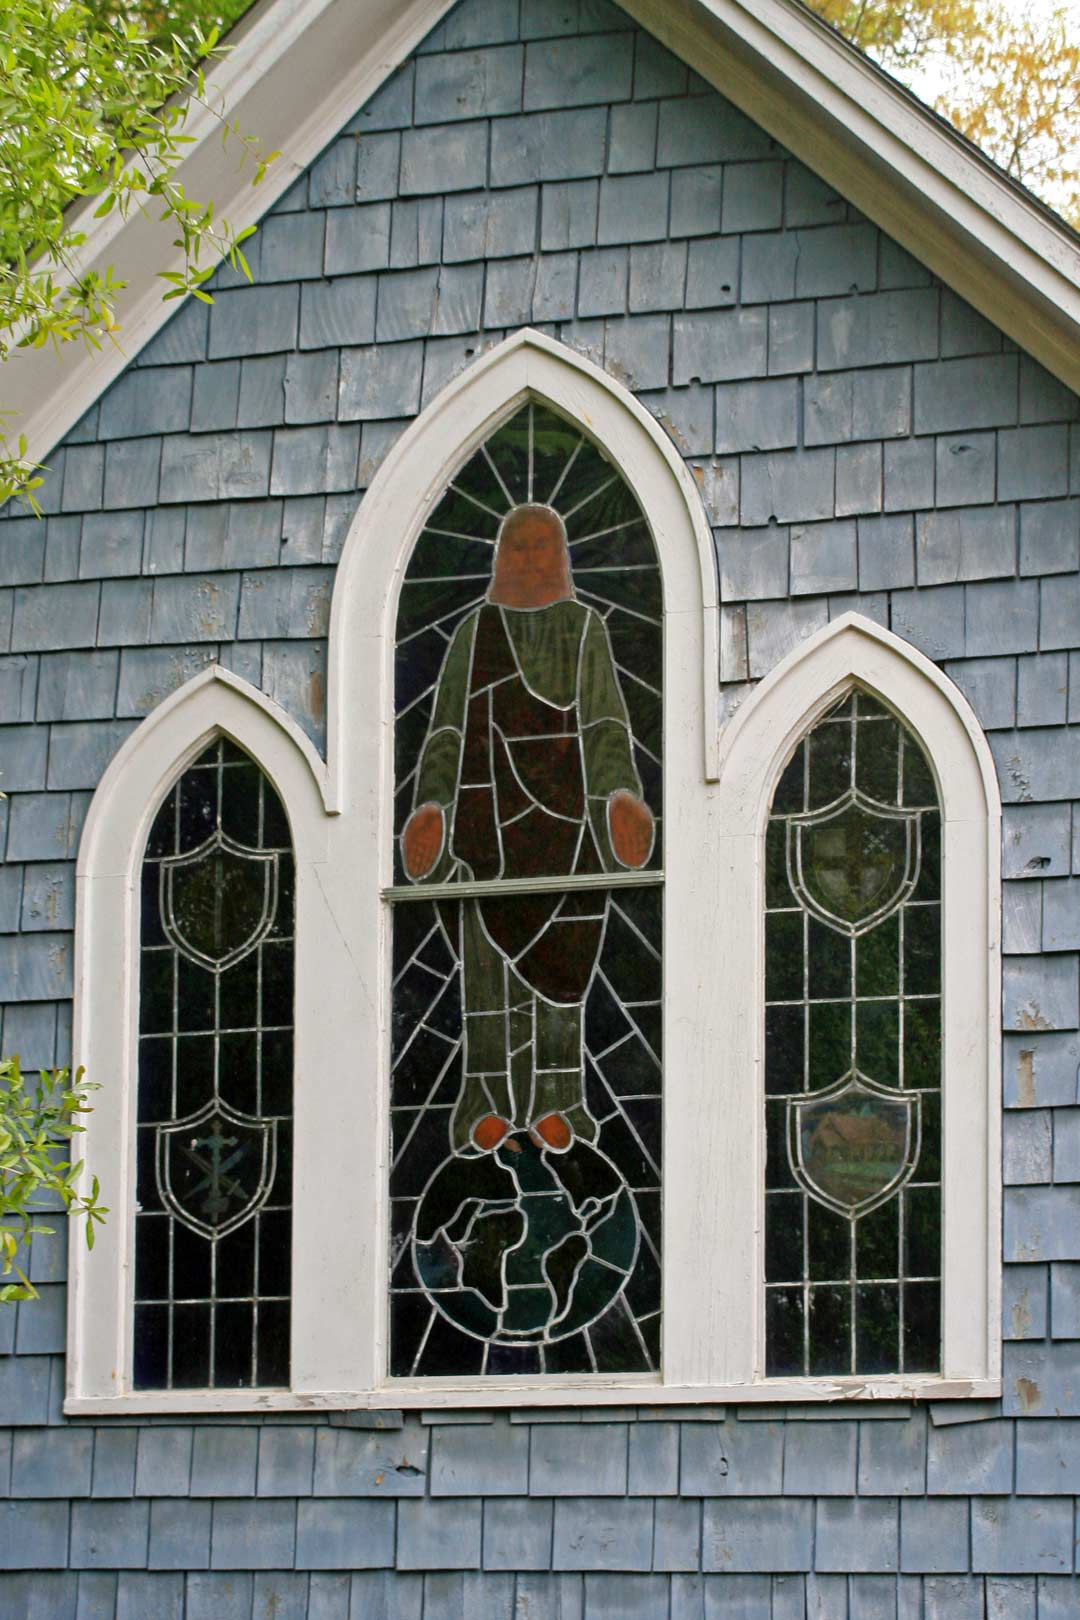 St. Alban's Window